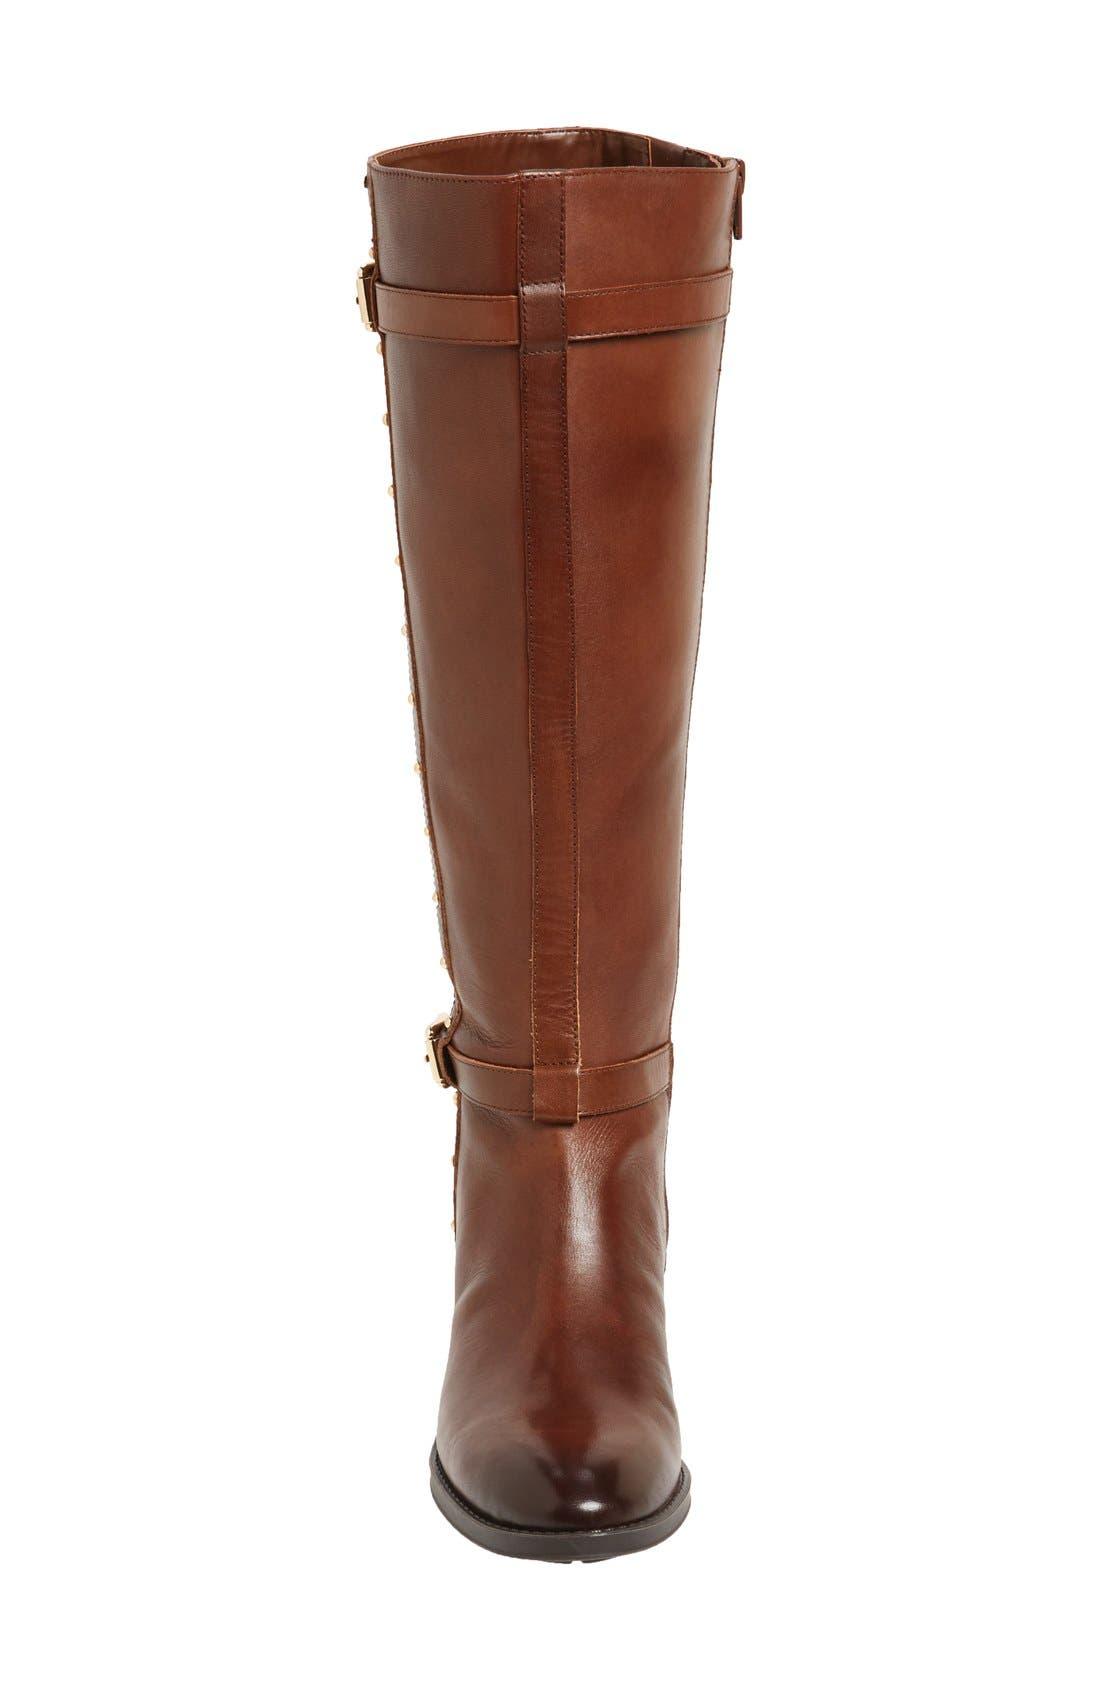 Alternate Image 3  - Vince Camuto 'Preslen' Riding Boot (Women) (Wide Calf)